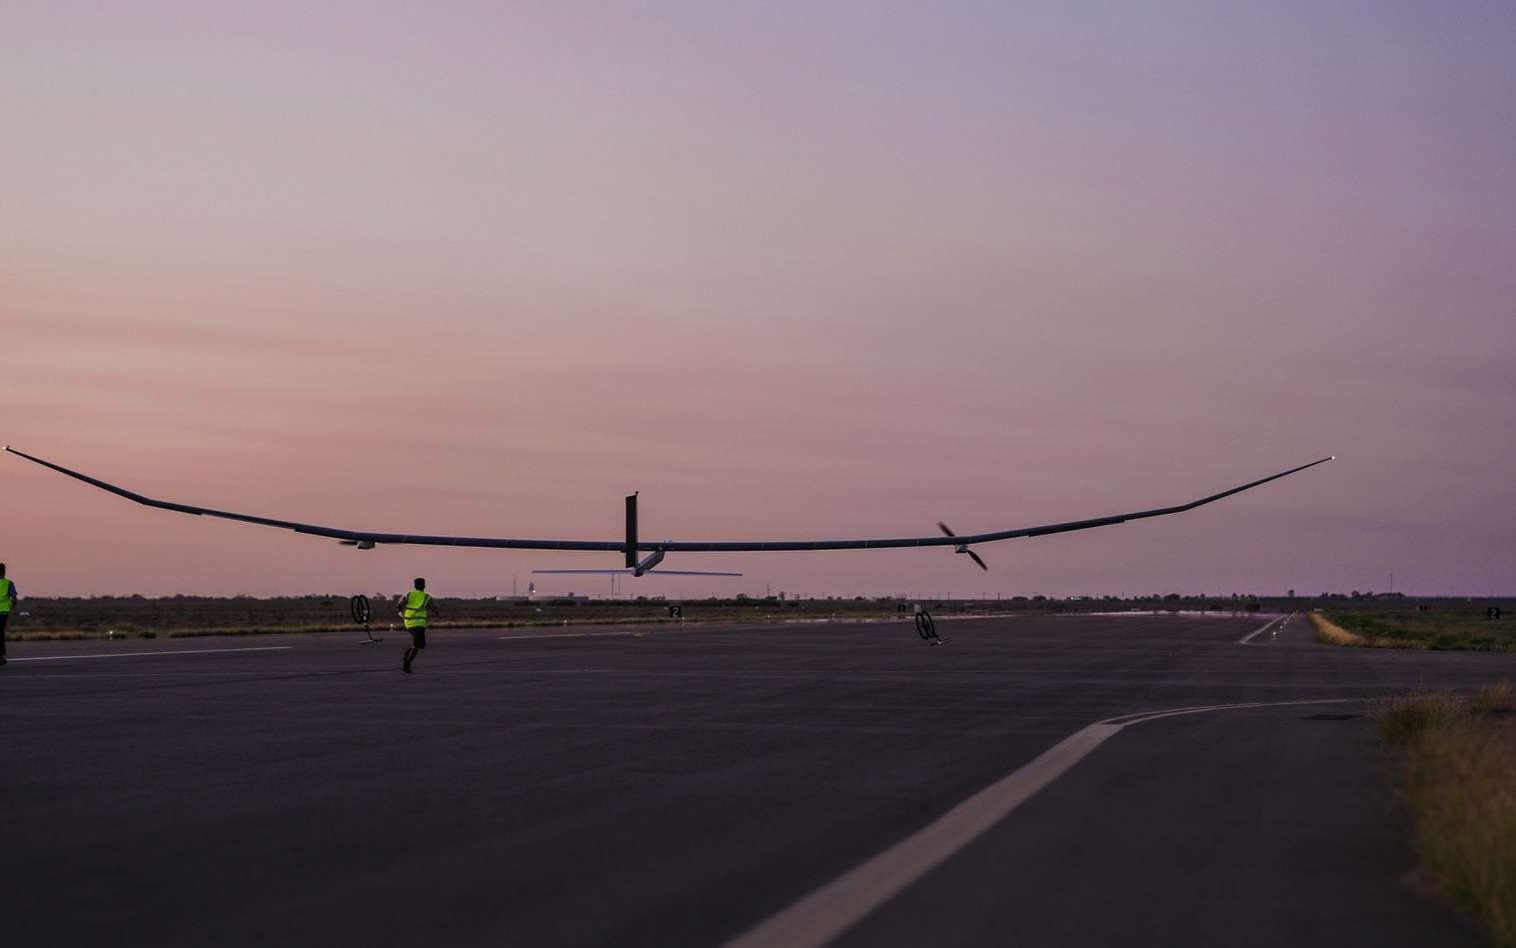 Le drone solaire Phasa-35 de BAE Systems. © BAE Systems